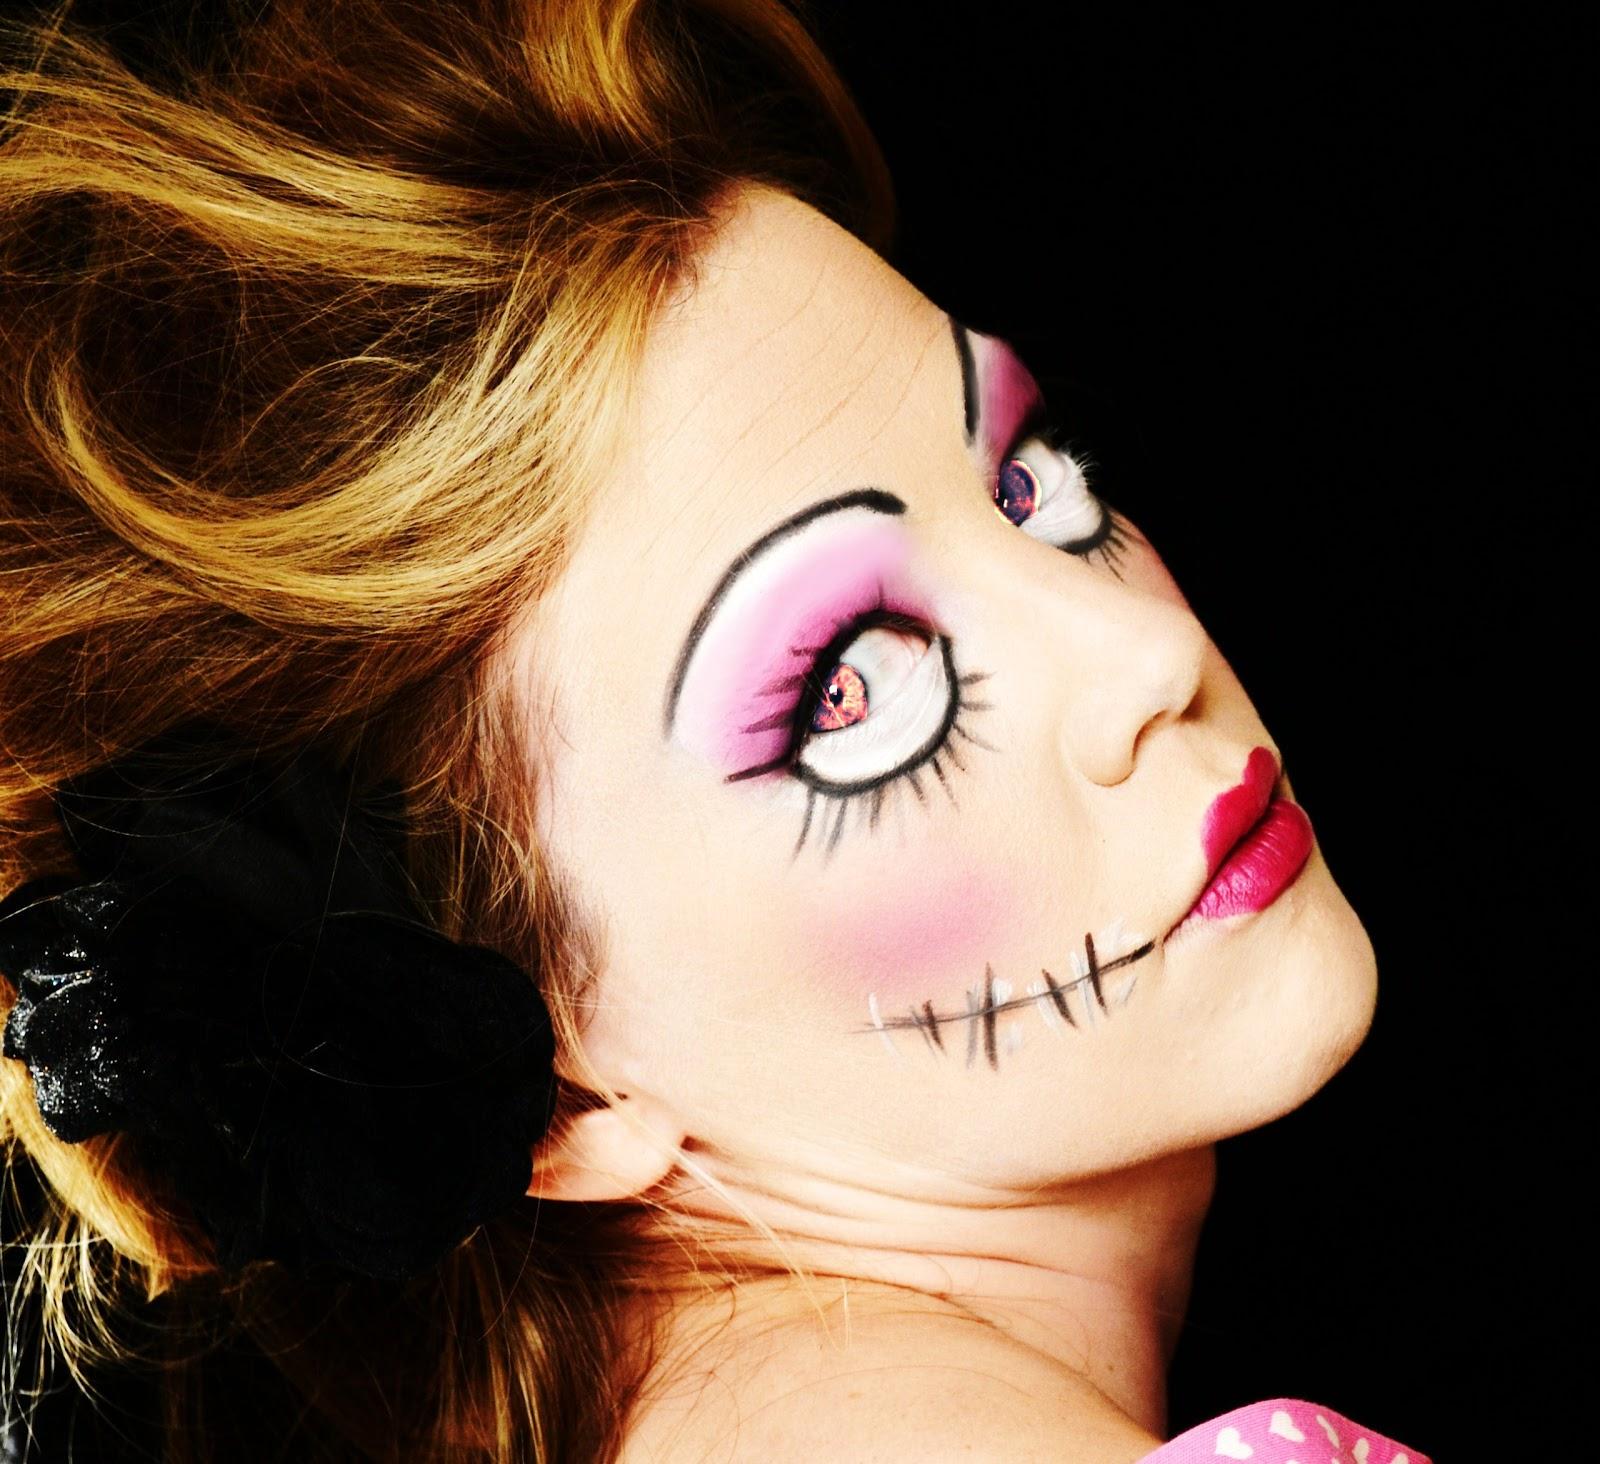 makeuplouisa: halloween - doll make-up